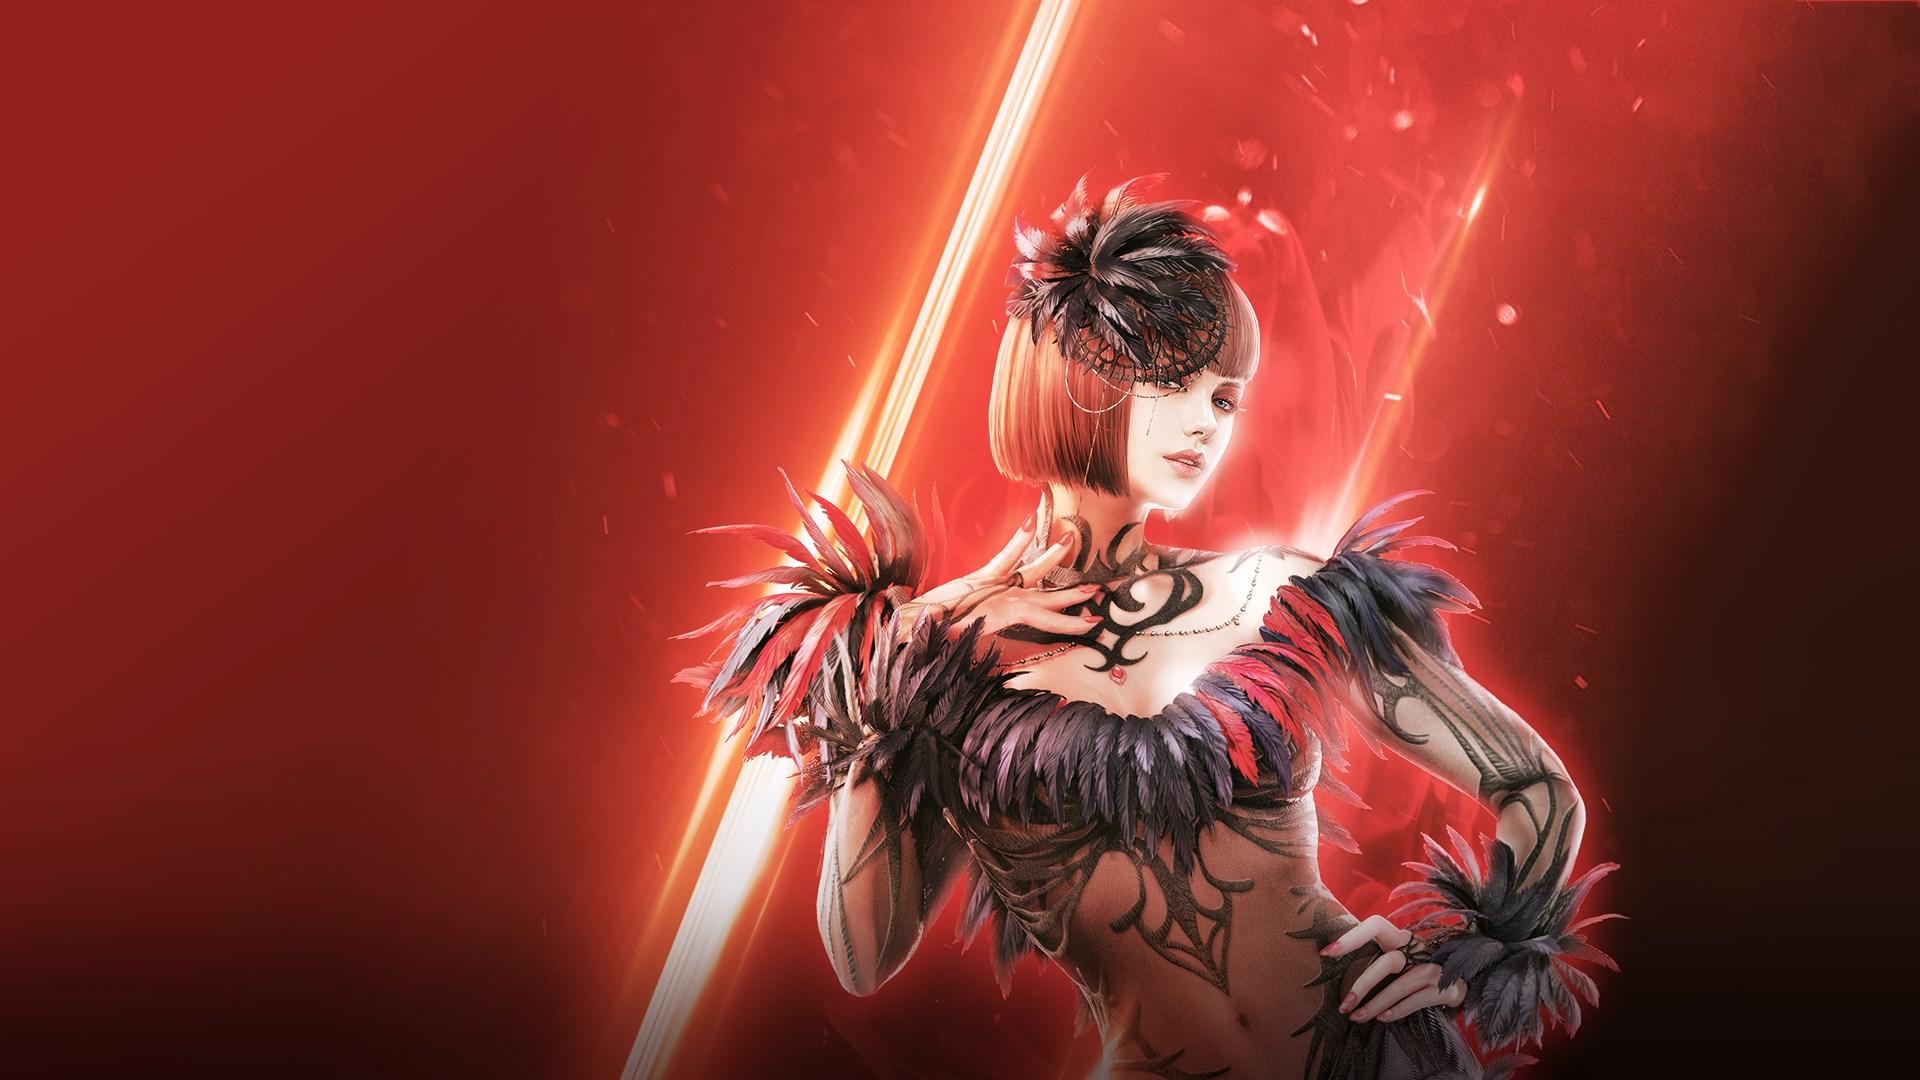 TEKKEN 7 - DLC4: Anna Williams